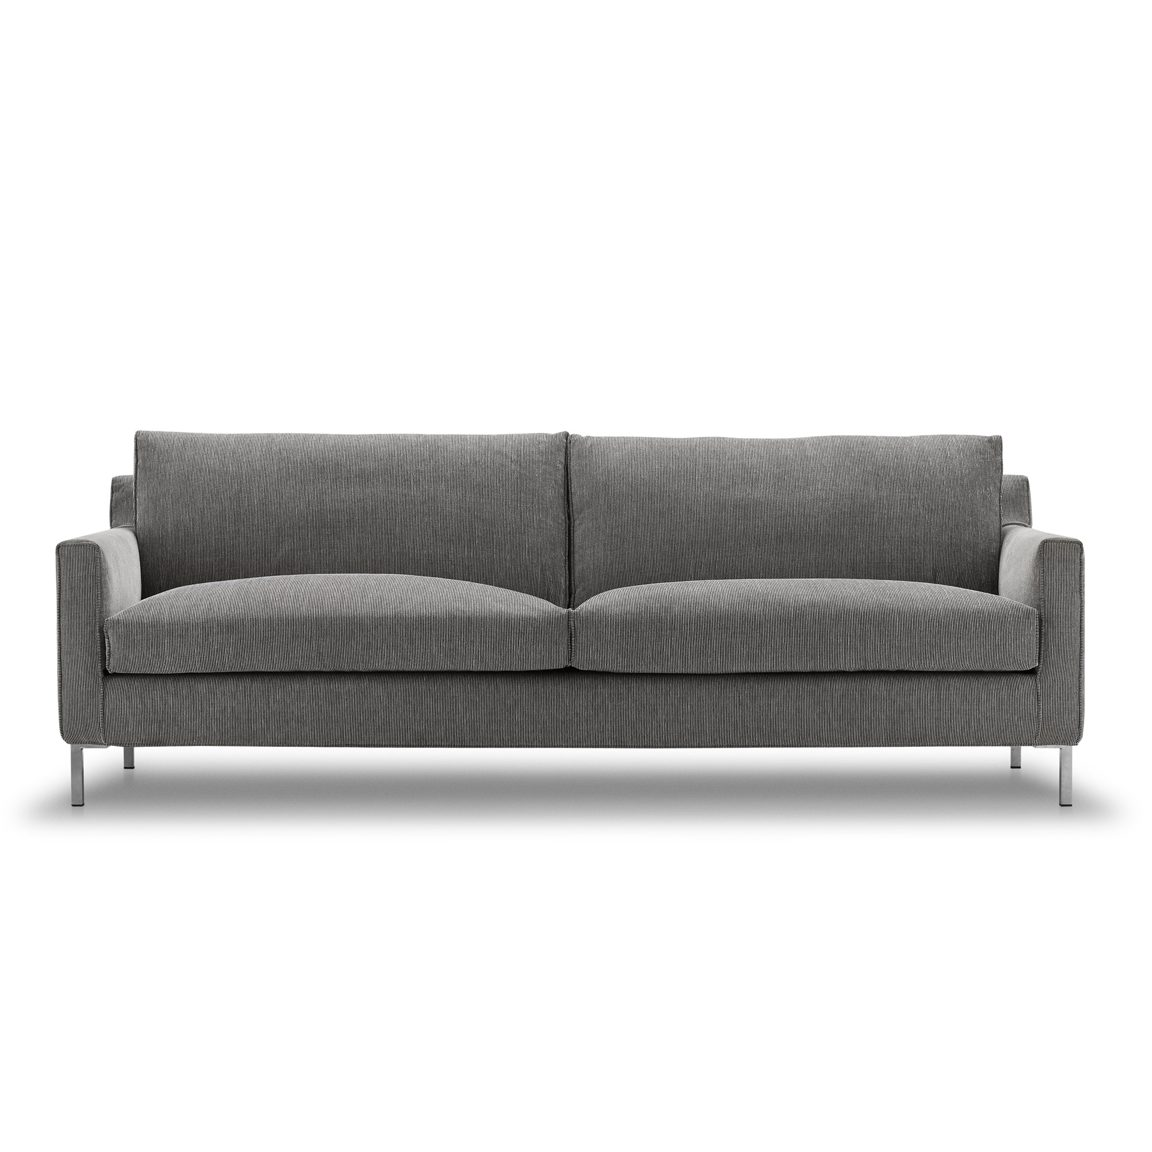 Streamline soffa